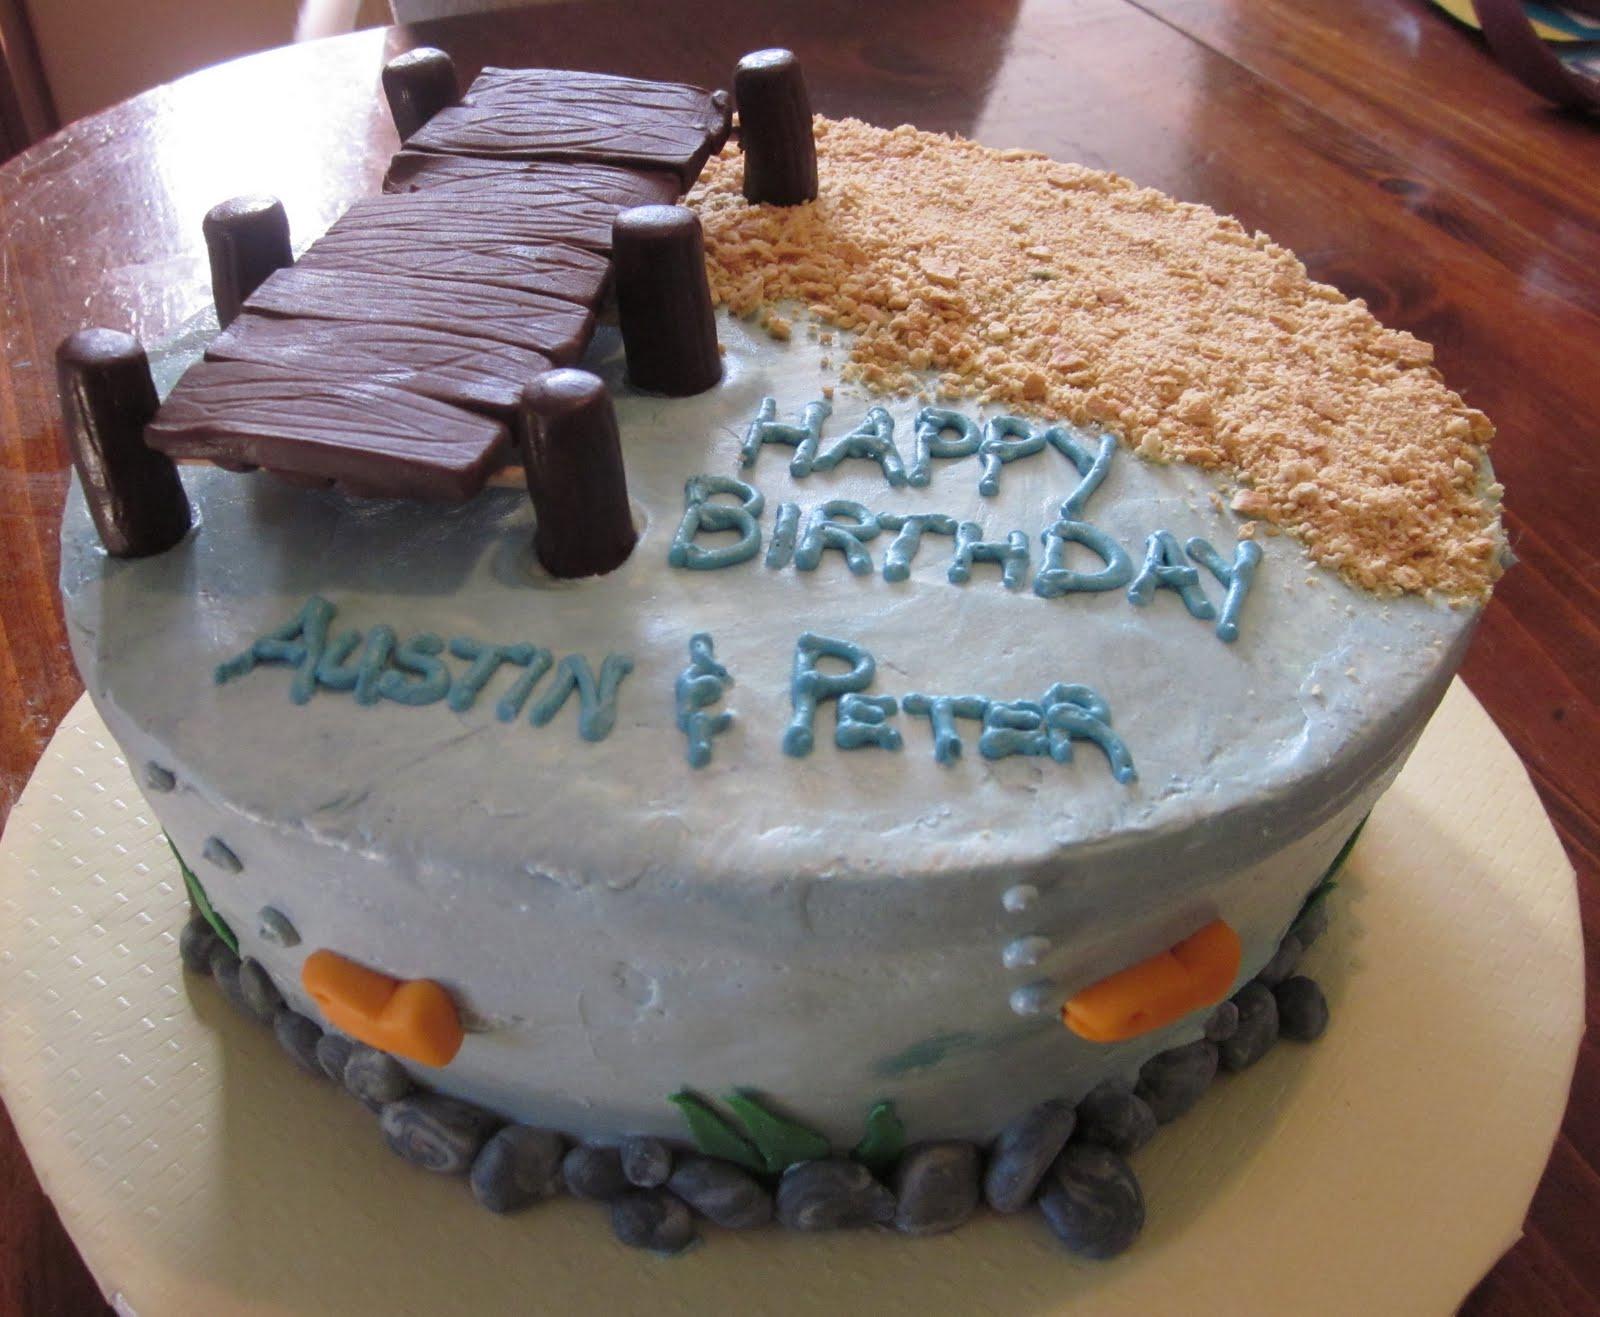 Second generation cake design fishing birthday cake for Fish cake design